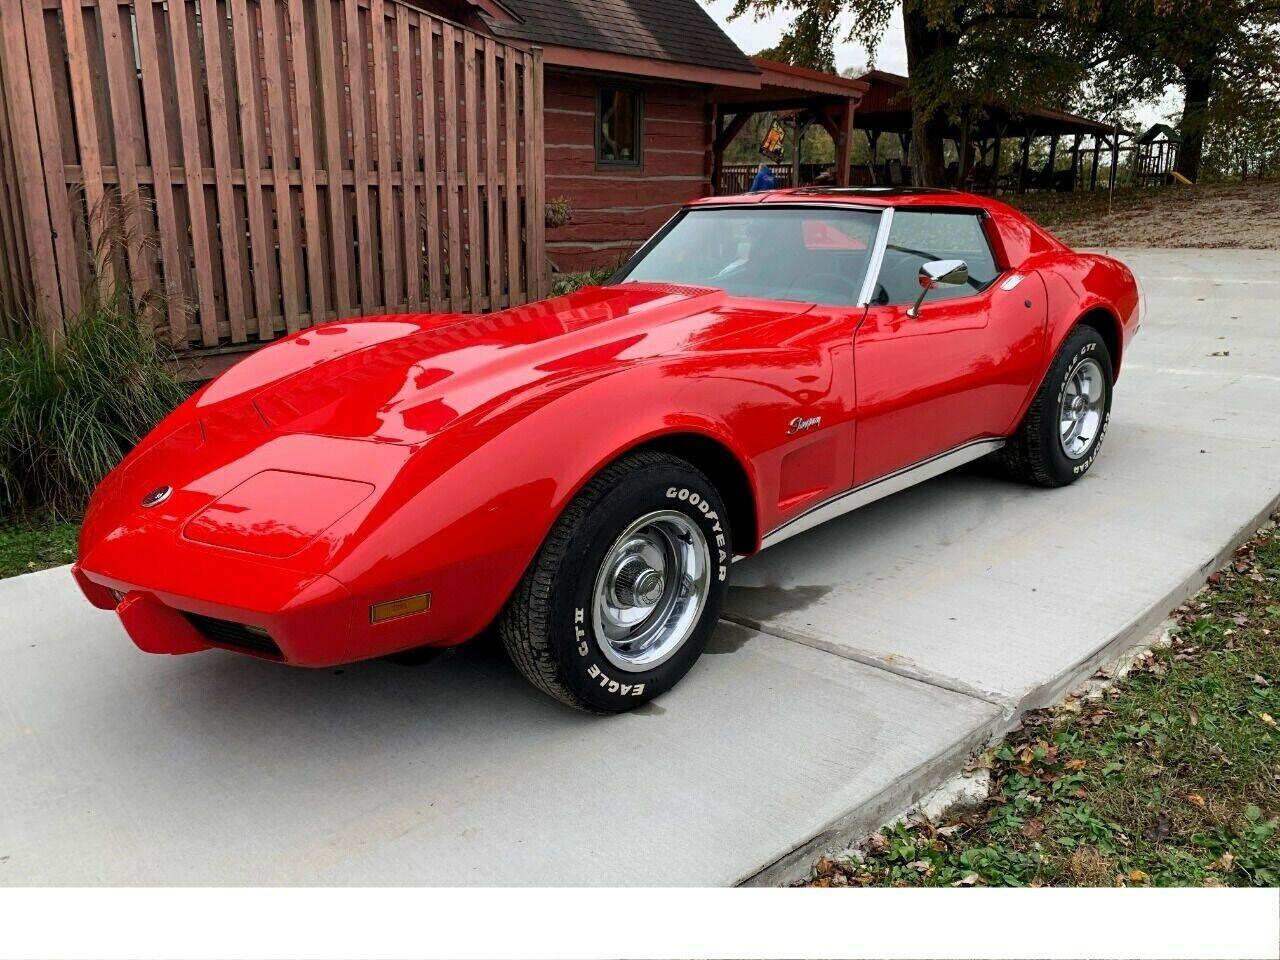 1976 Red Chevrolet Corvette     C3 Corvette Photo 1